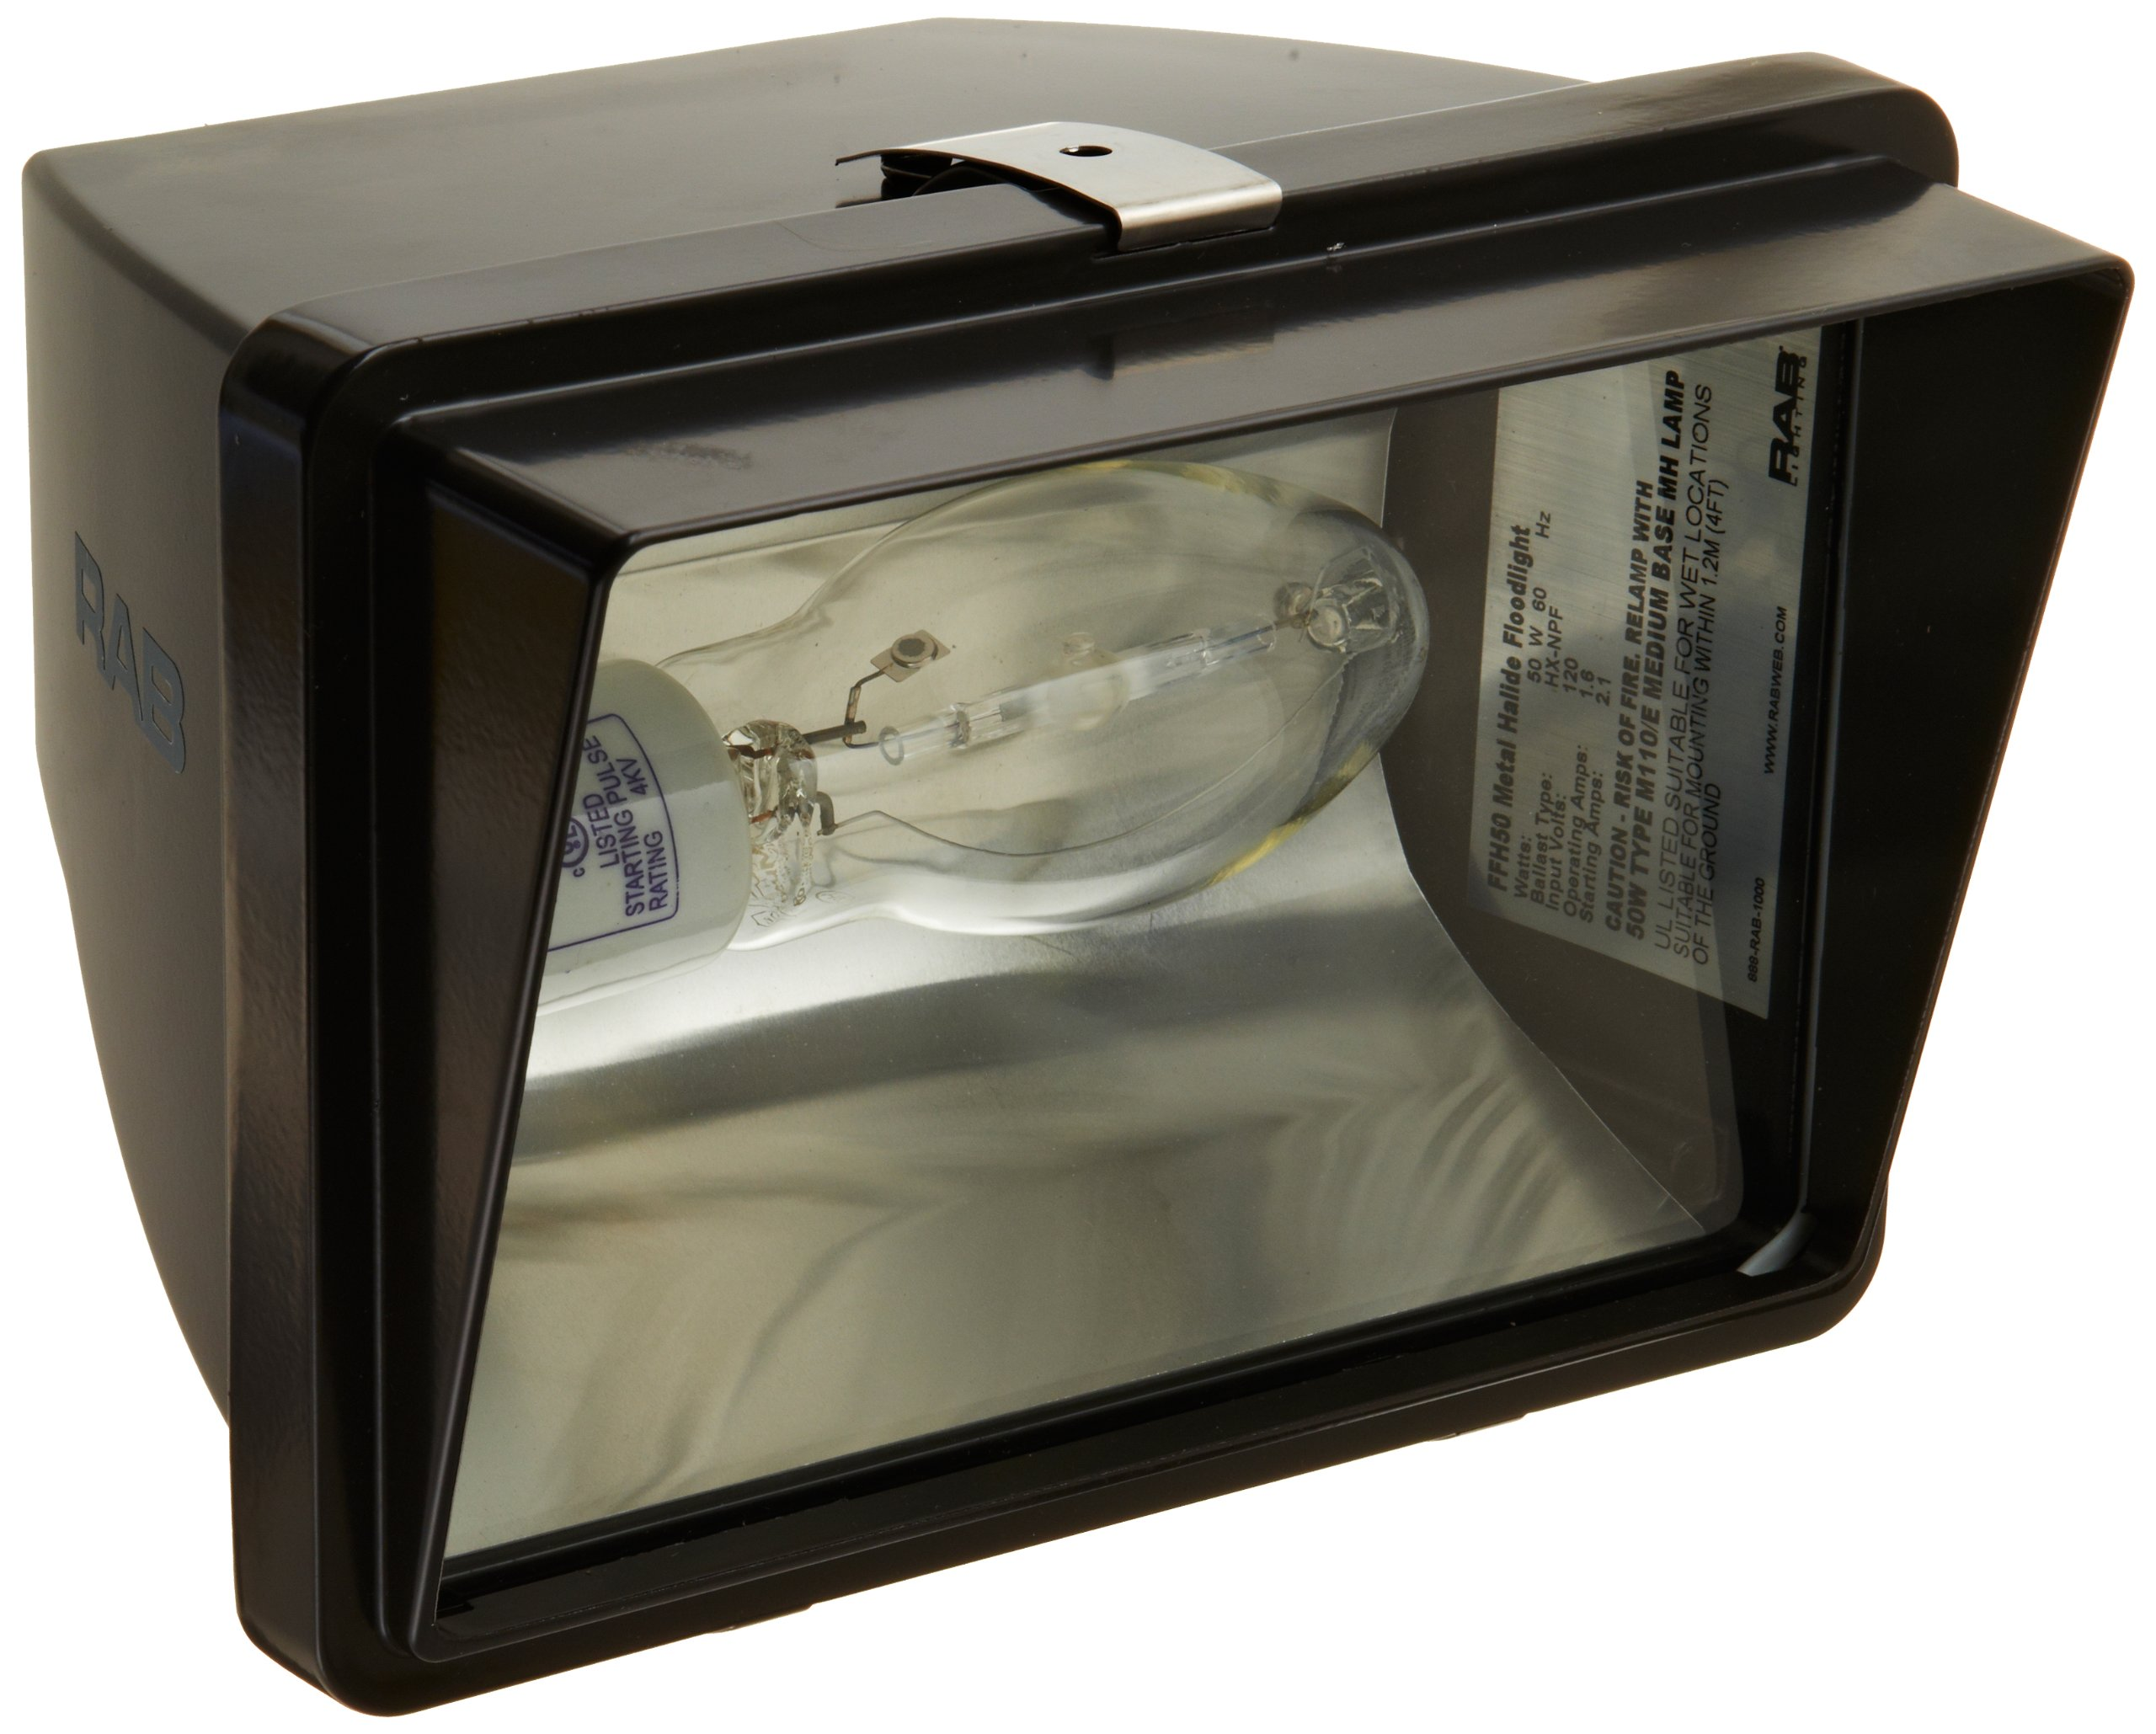 RAB Lighting FFH50 Metal Halide HID Future Floodlight, ED17 Type, Aluminum, 50W Power, 3400 Lumens, 120V, Bronze Color